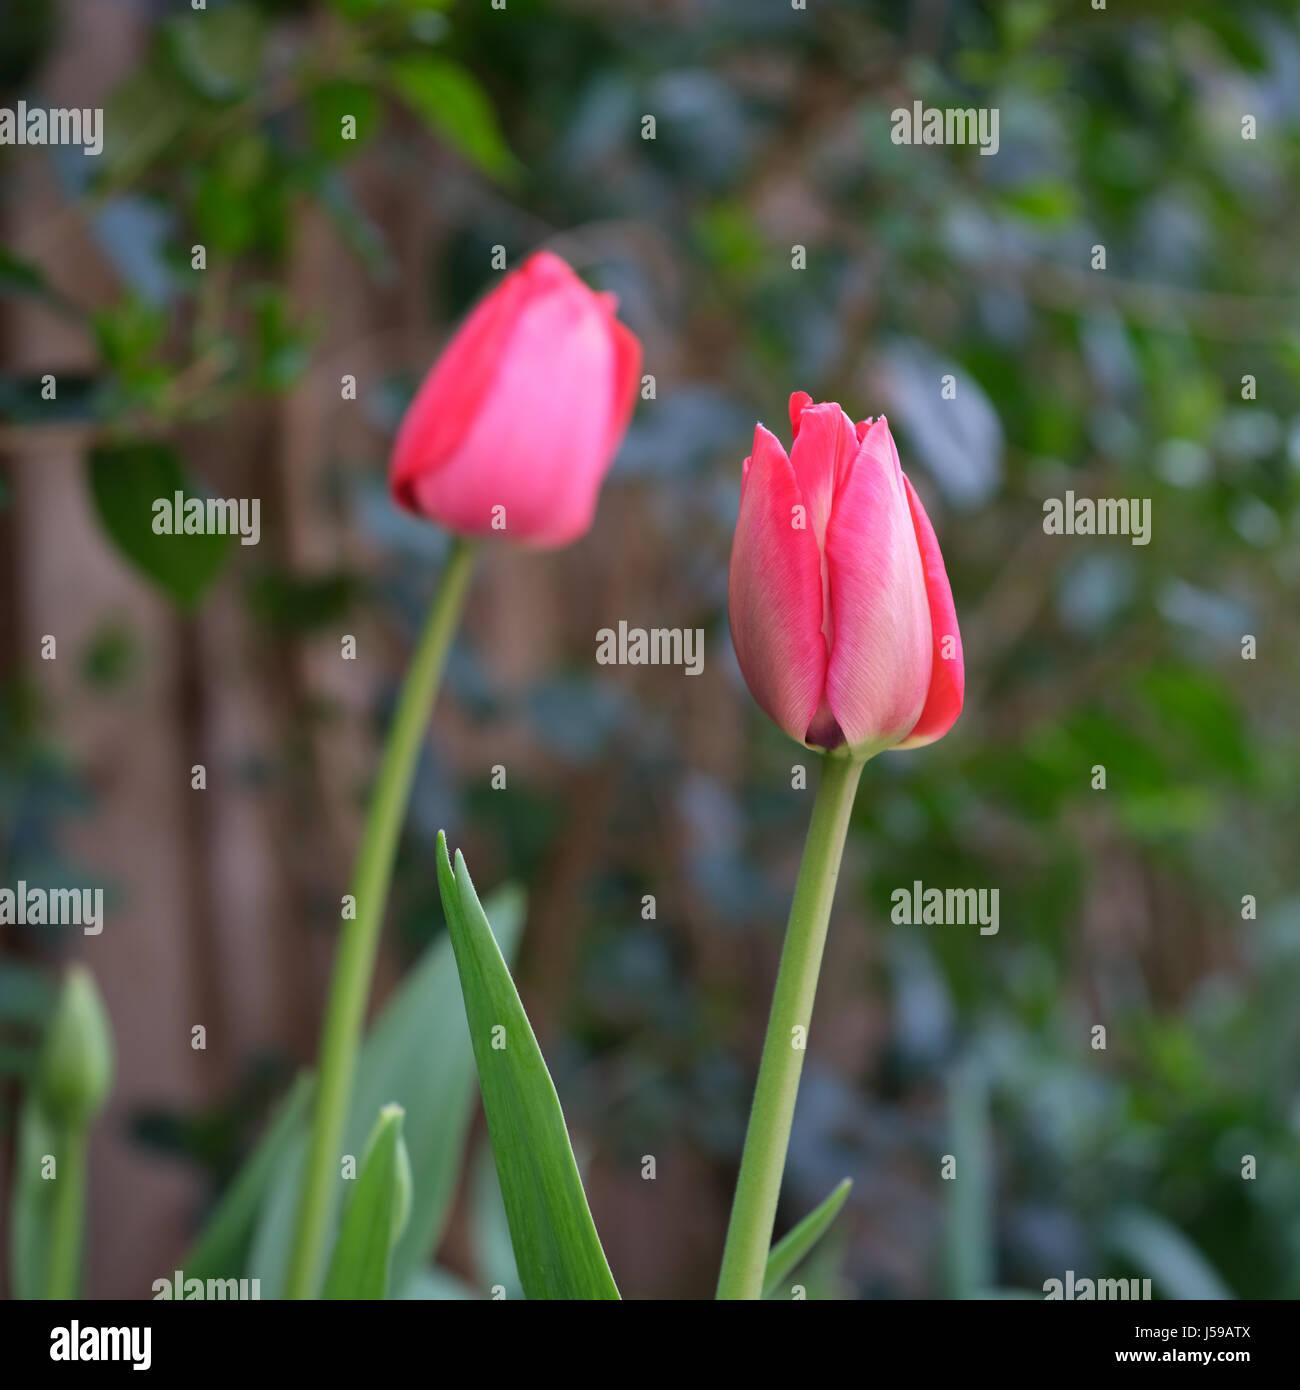 Pink tulip portrait - Stock Image